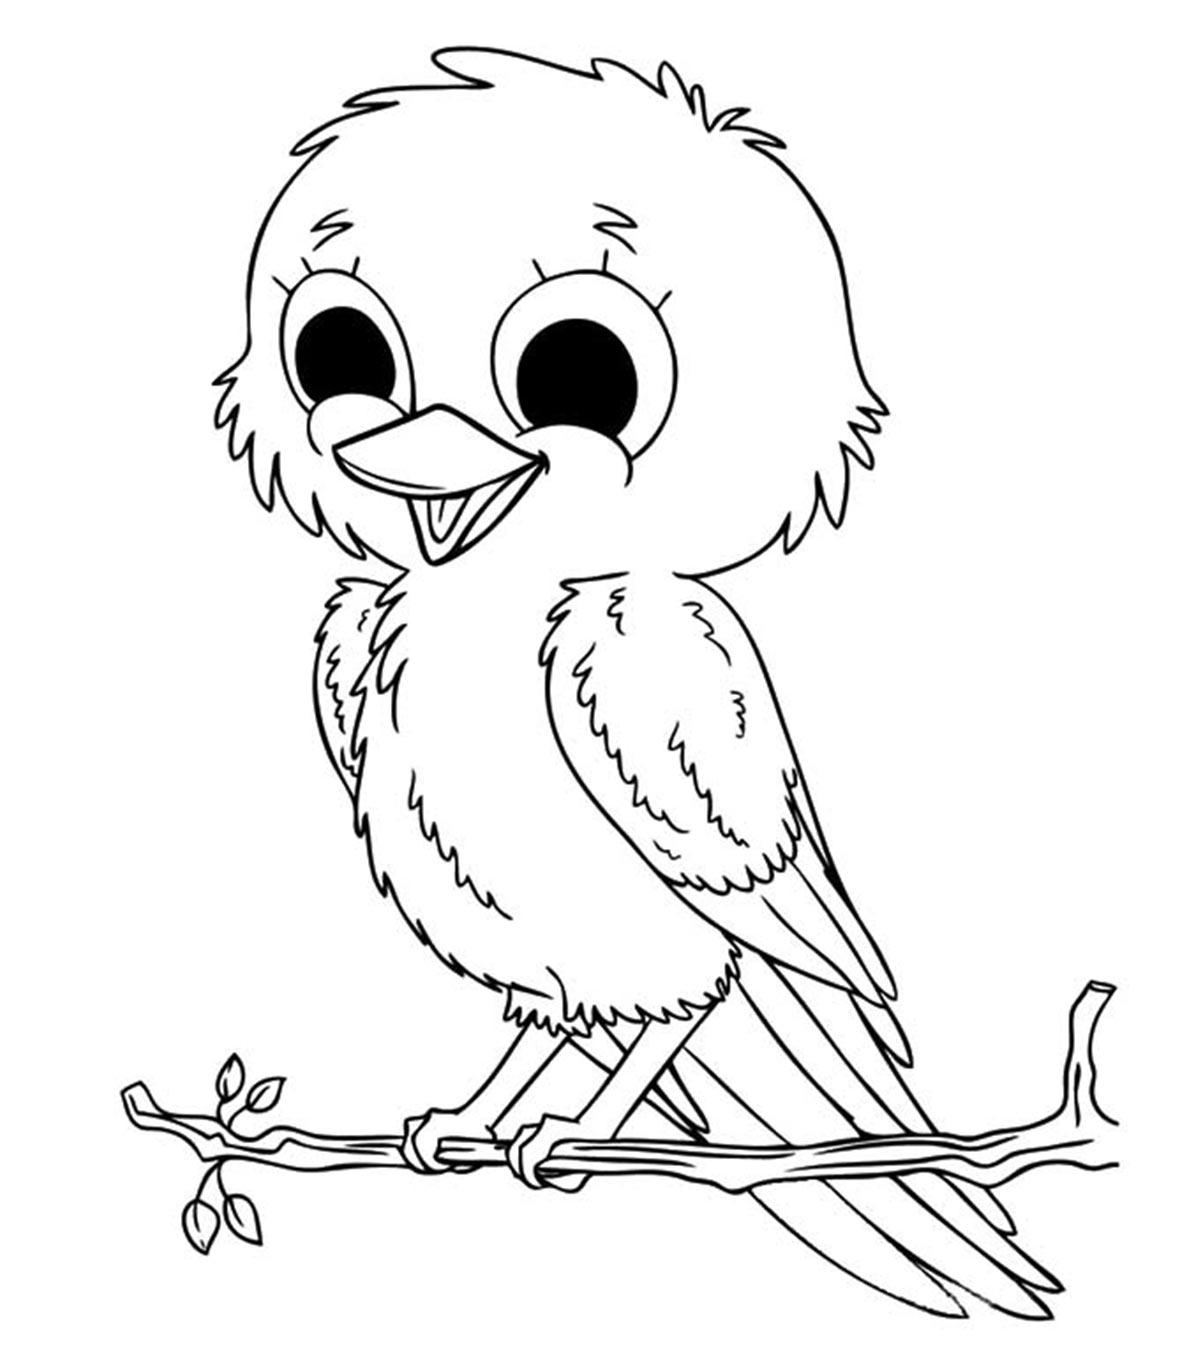 33 Tremendous Bird Coloring Book Printable – azspring | 1350x1200